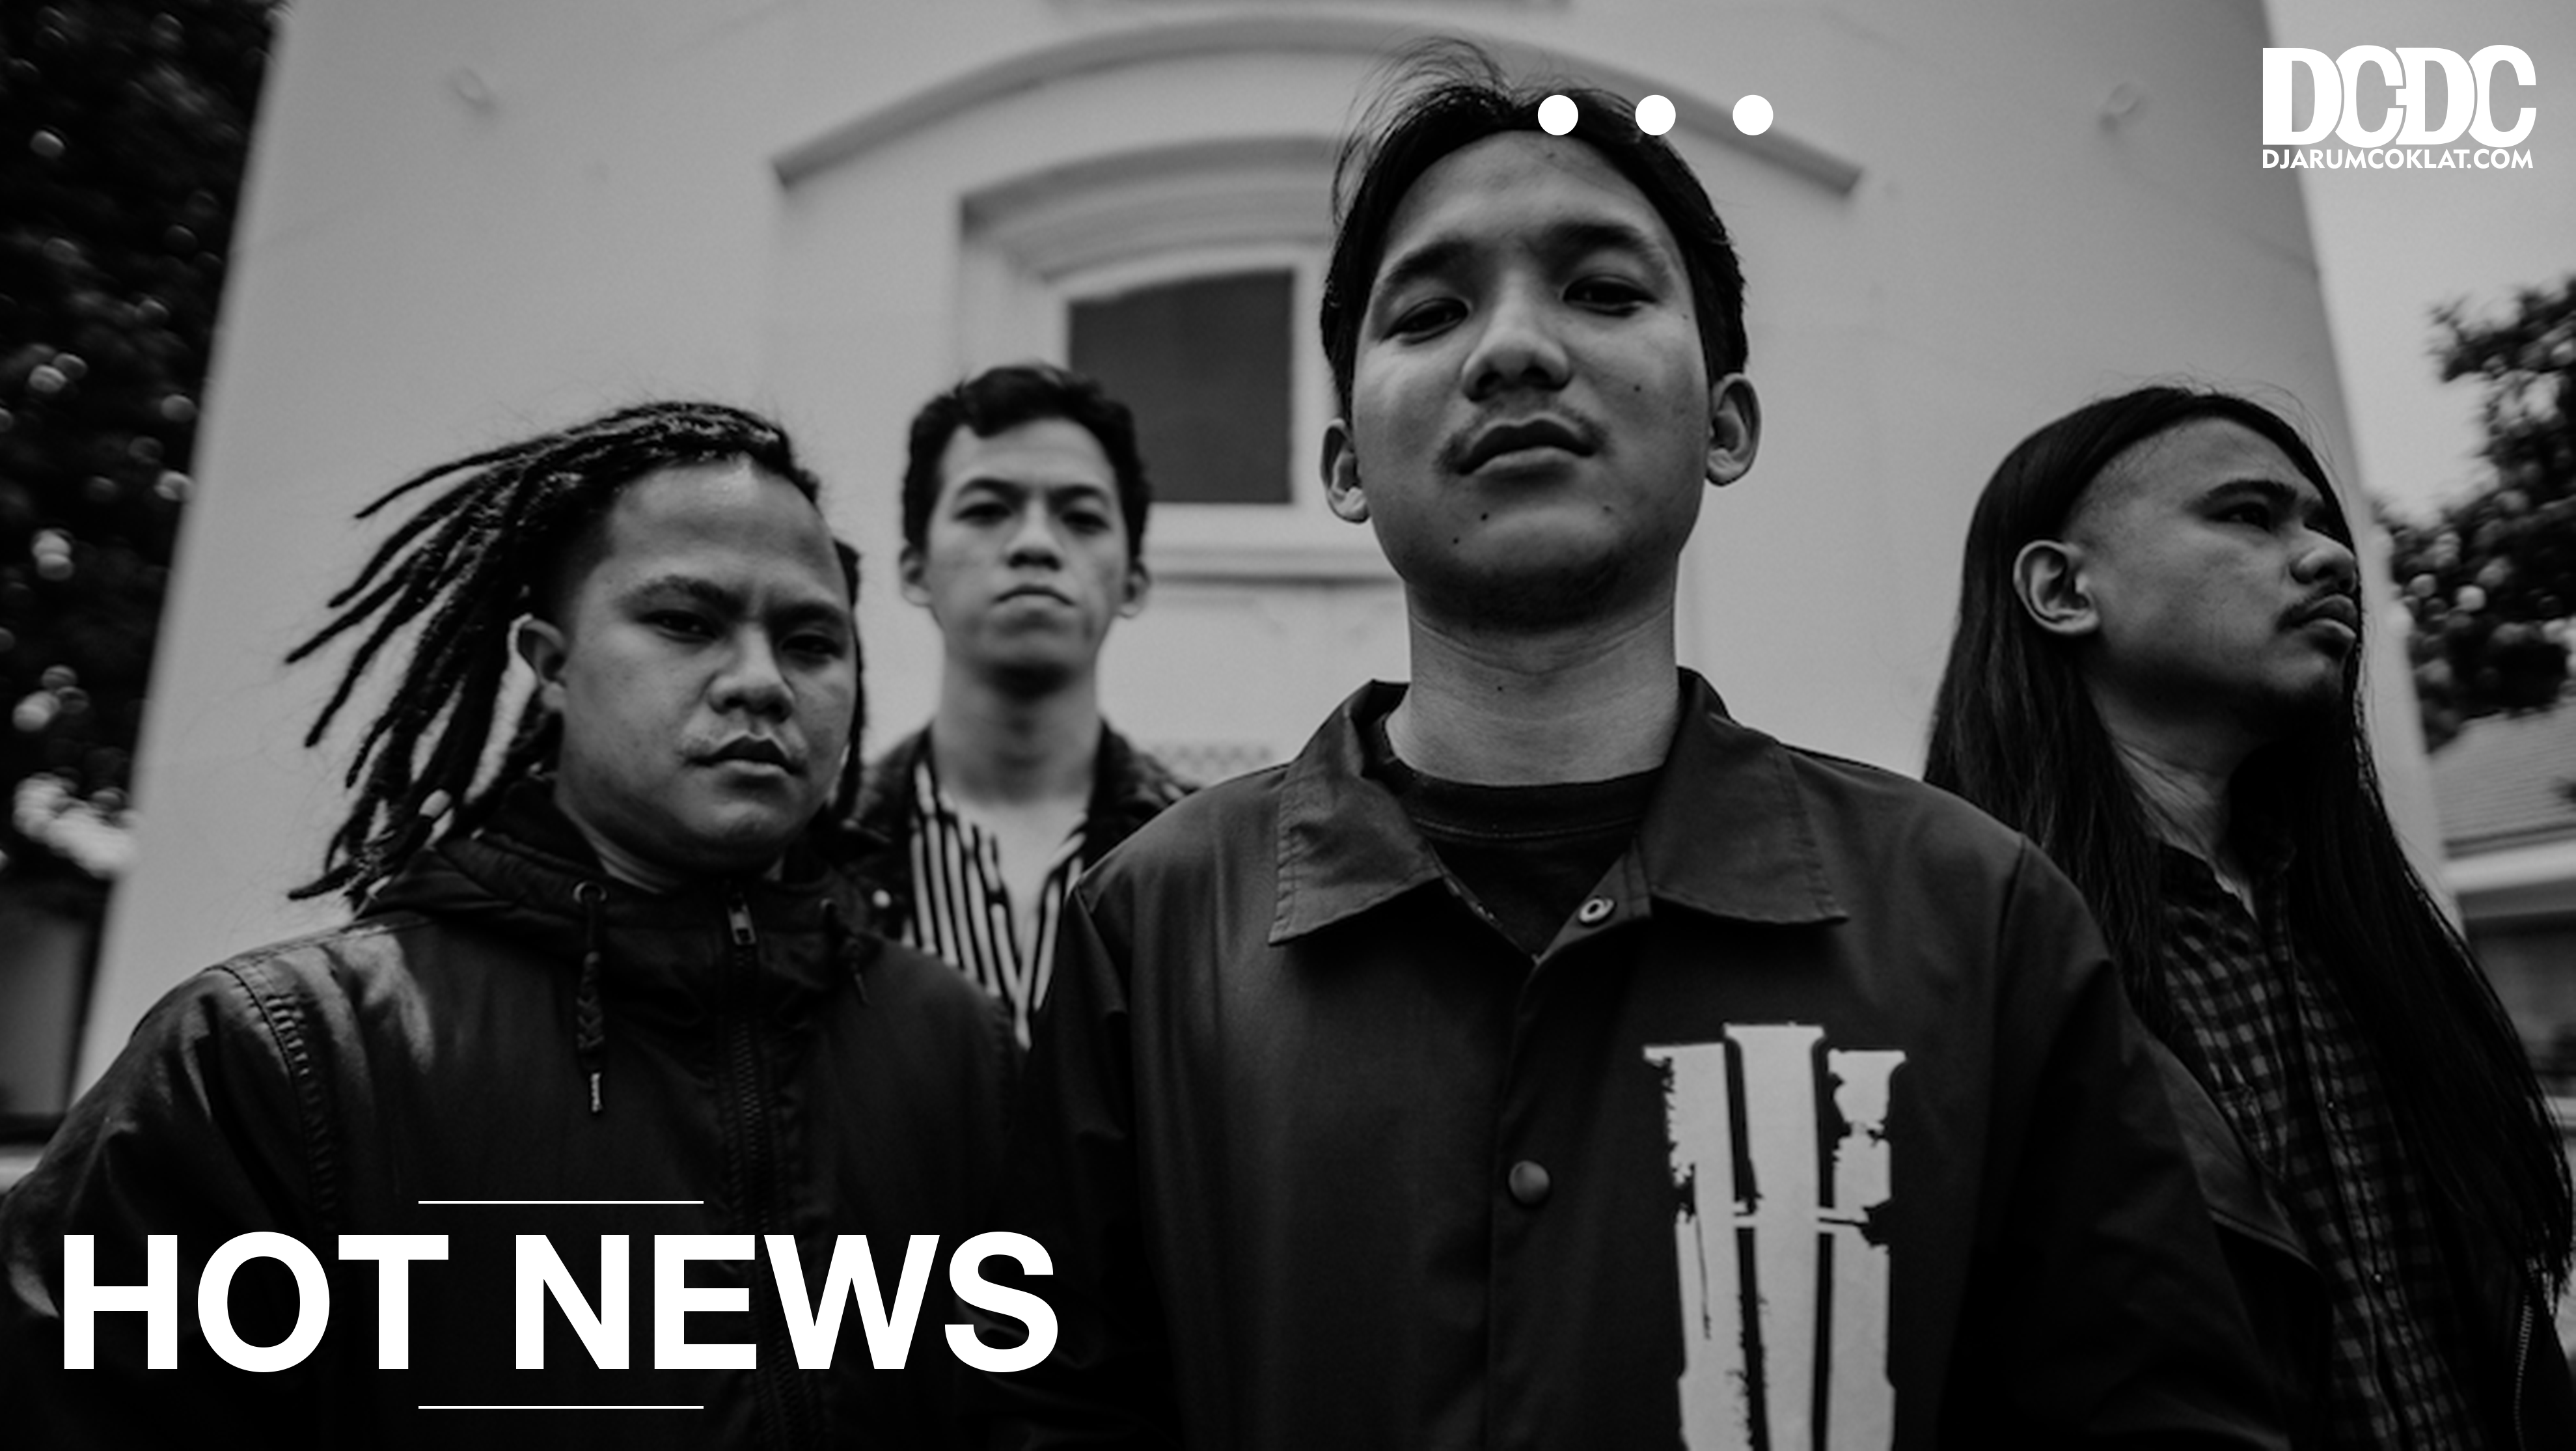 'Squalor' : Mencoba Merangkum Derita Dalam Debut Album Holykillers